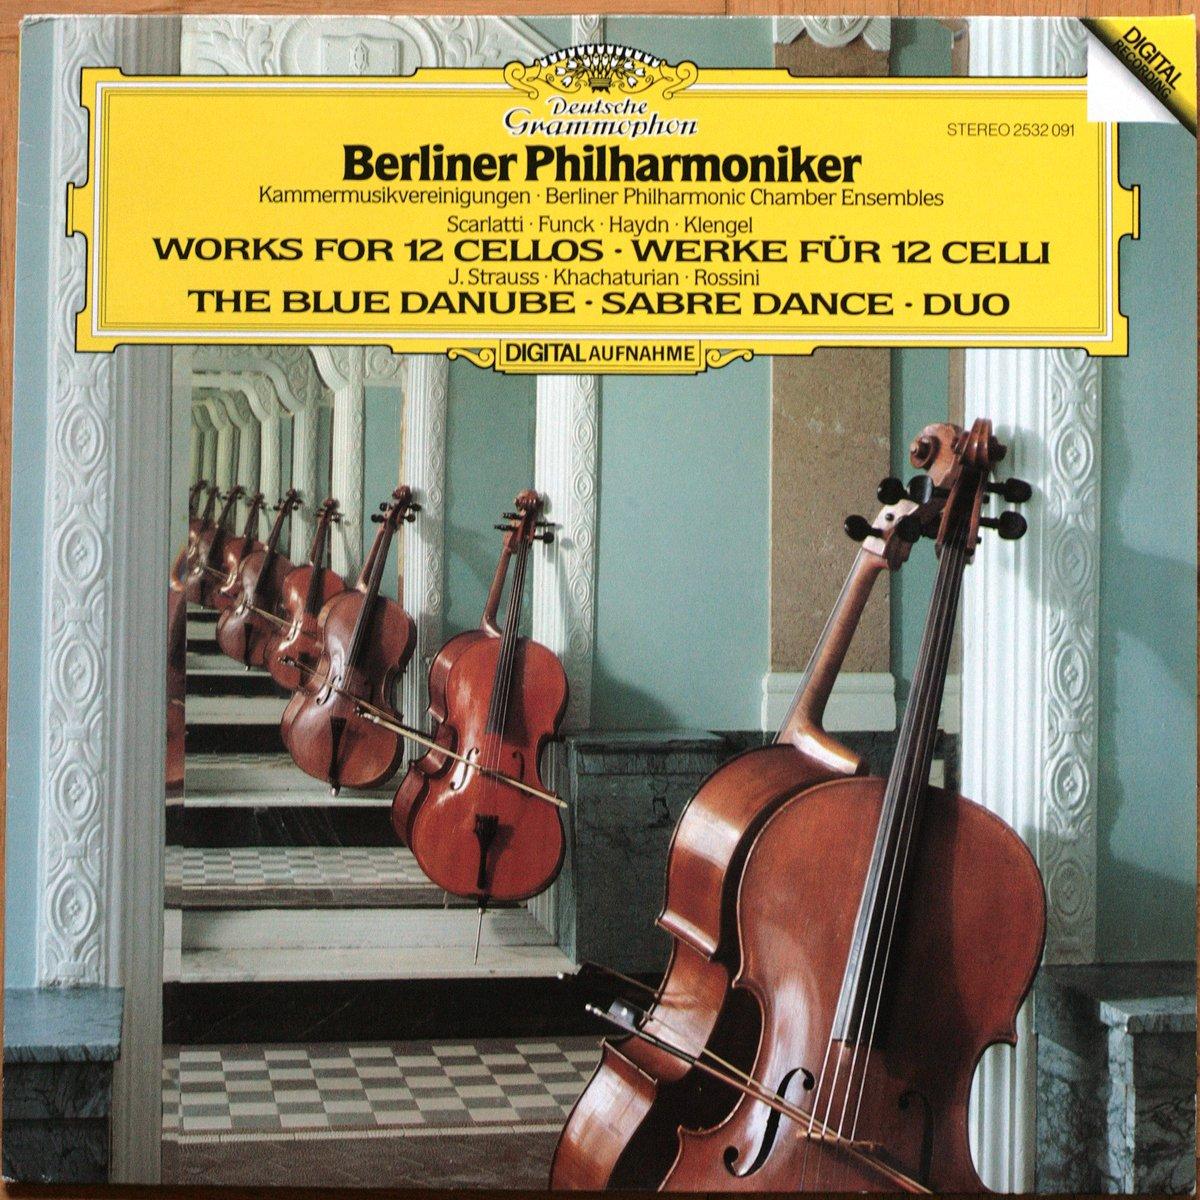 DGG 2532091 Werke 12 Celli Berliner Philharmoniker